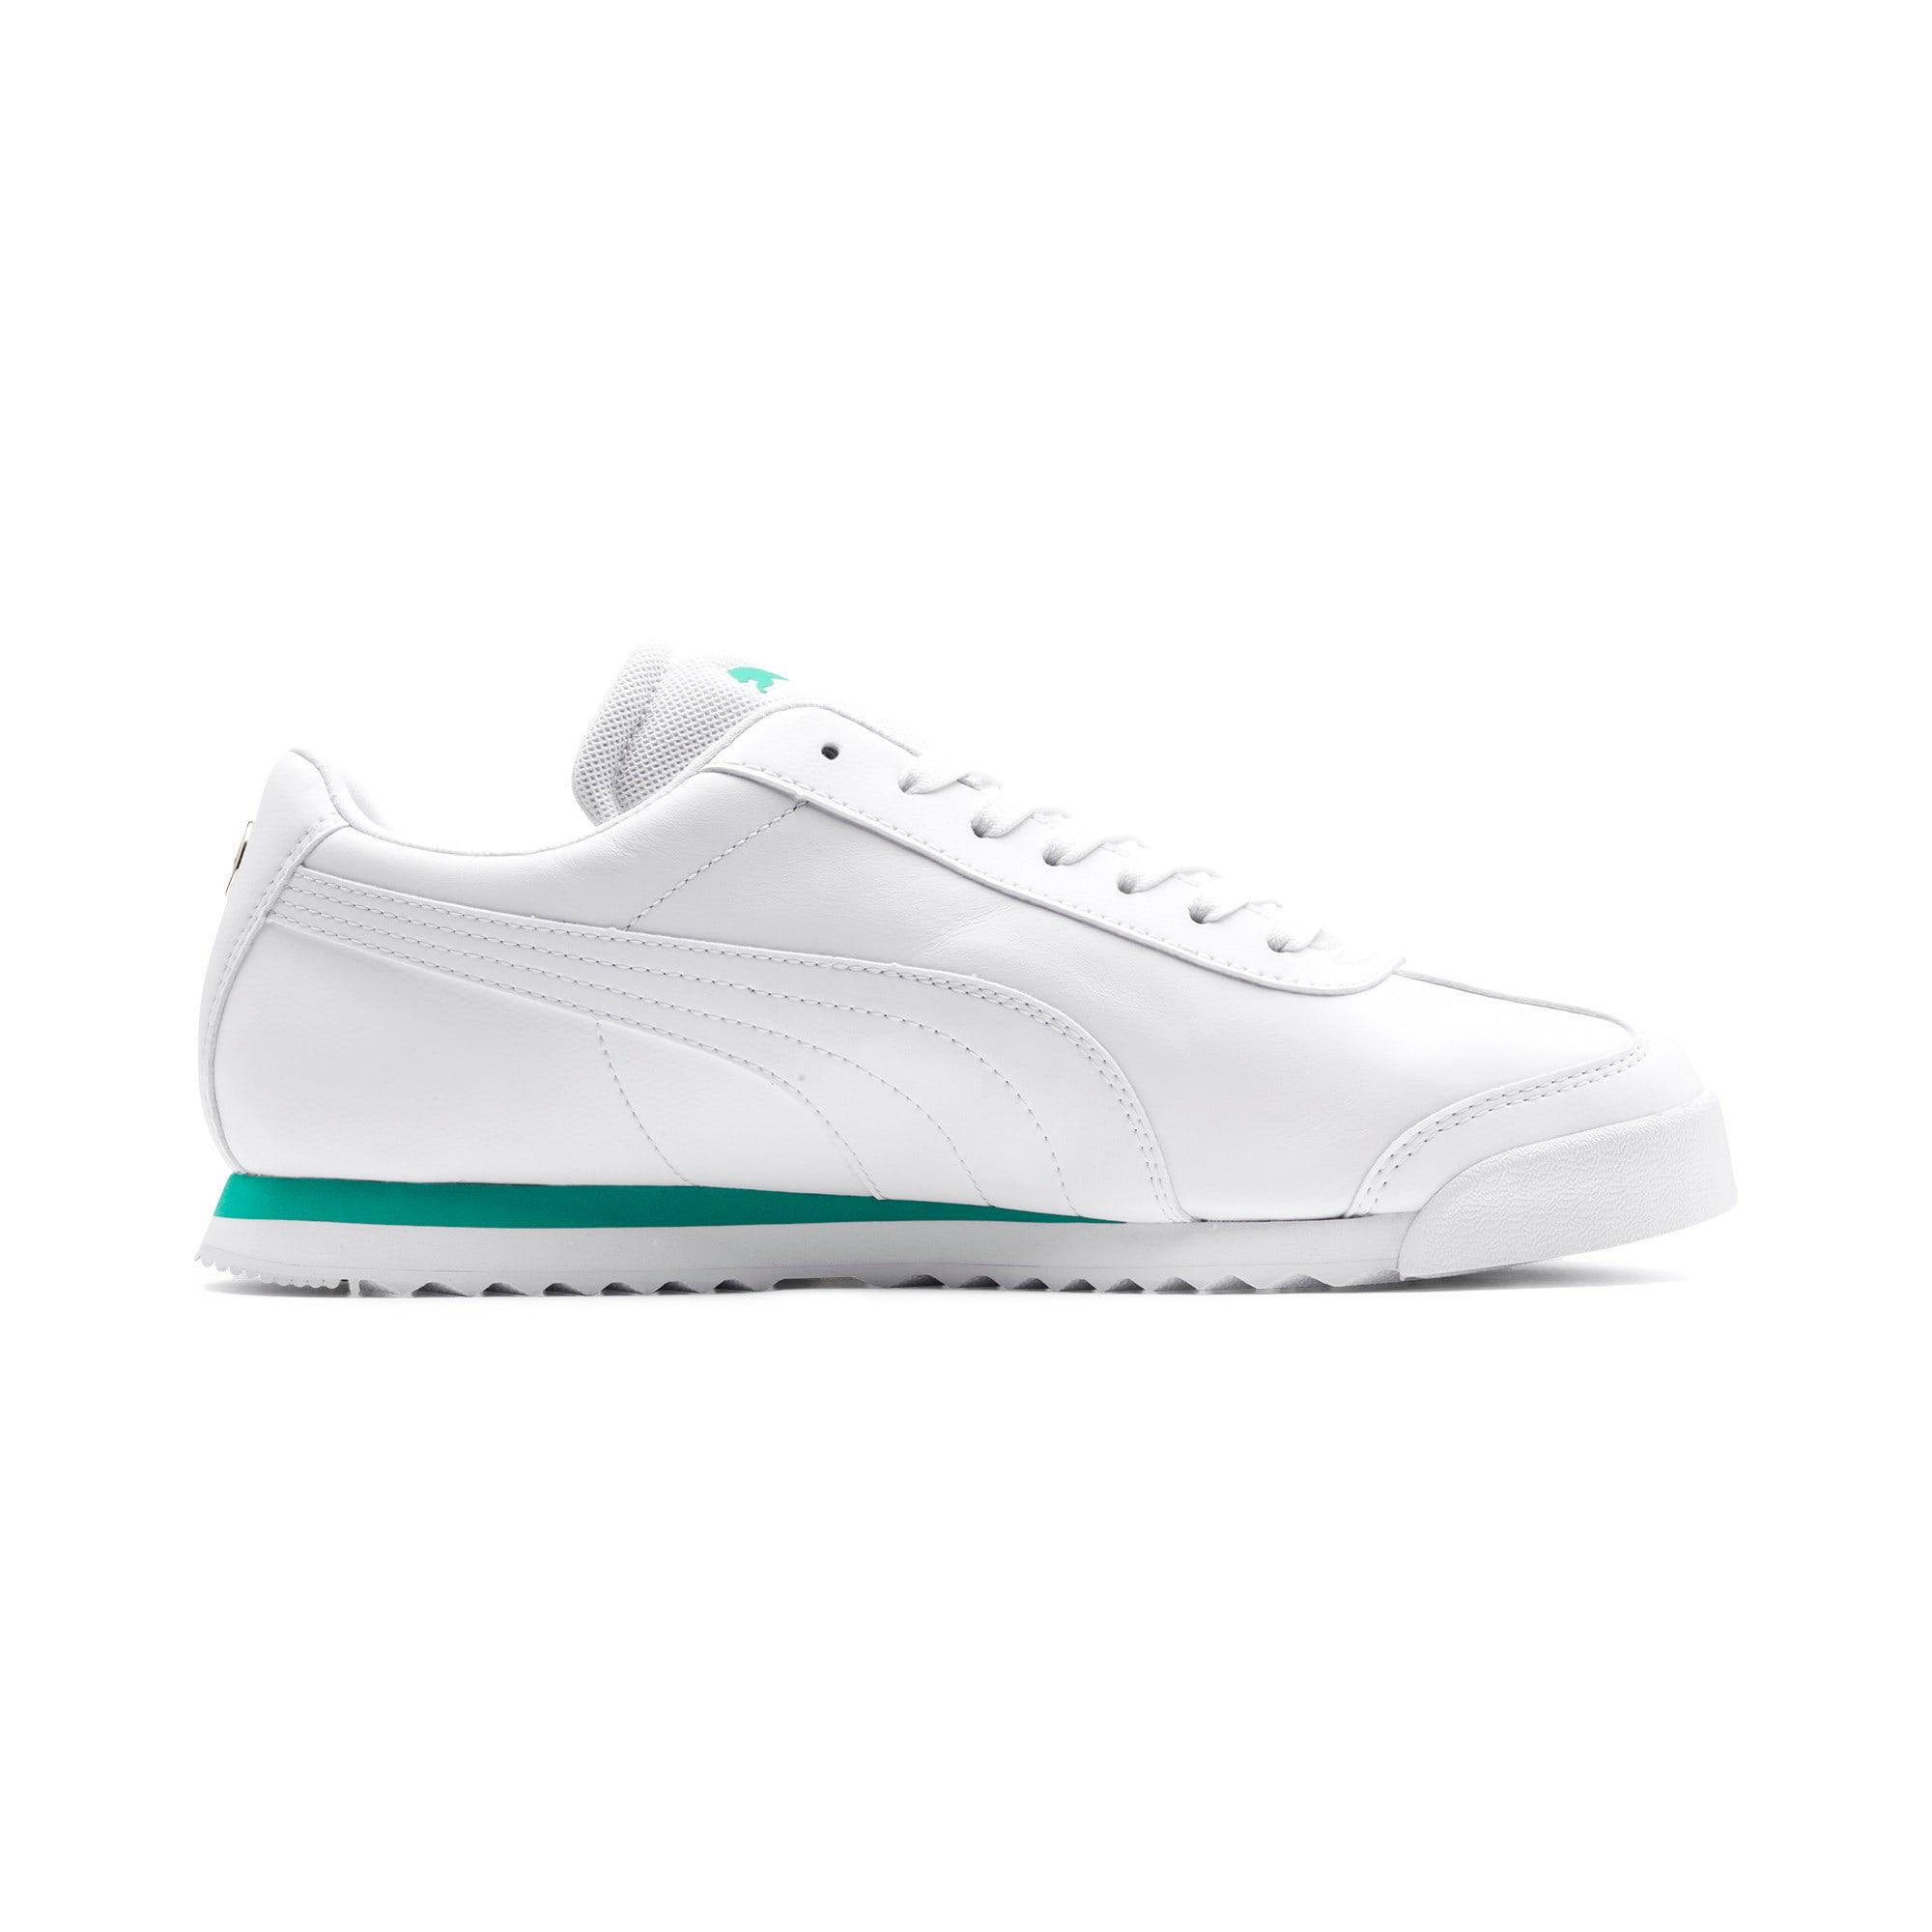 Thumbnail 6 of Mercedes AMG Petronas Roma Men's Sneakers, Puma White-Puma White, medium